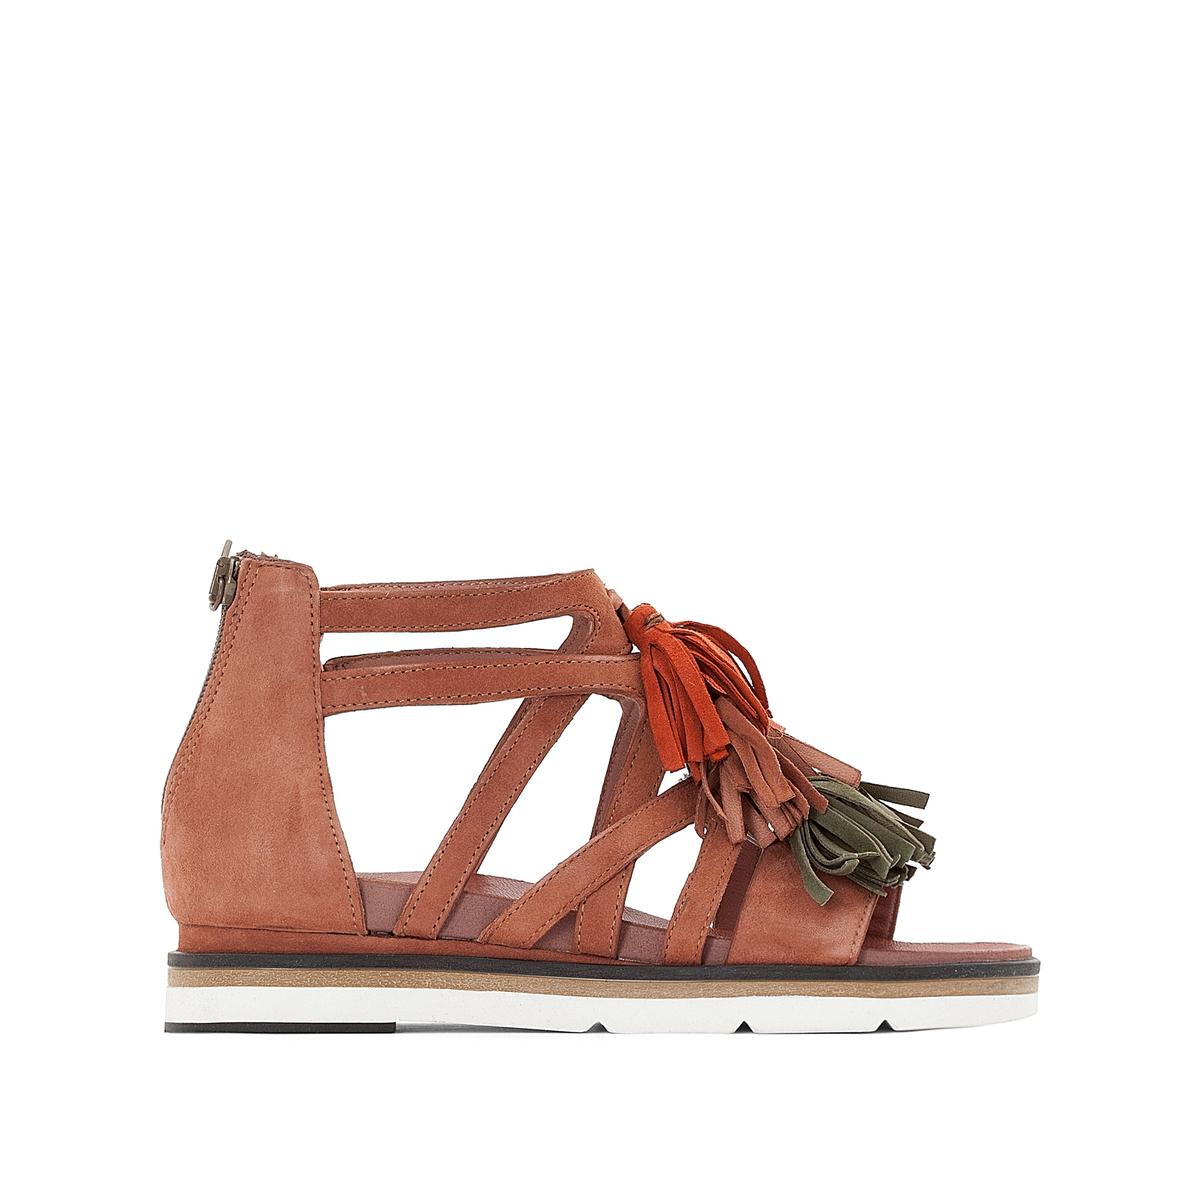 Босоножки кожаные на плоском каблуке, Ina ina international gx5414d